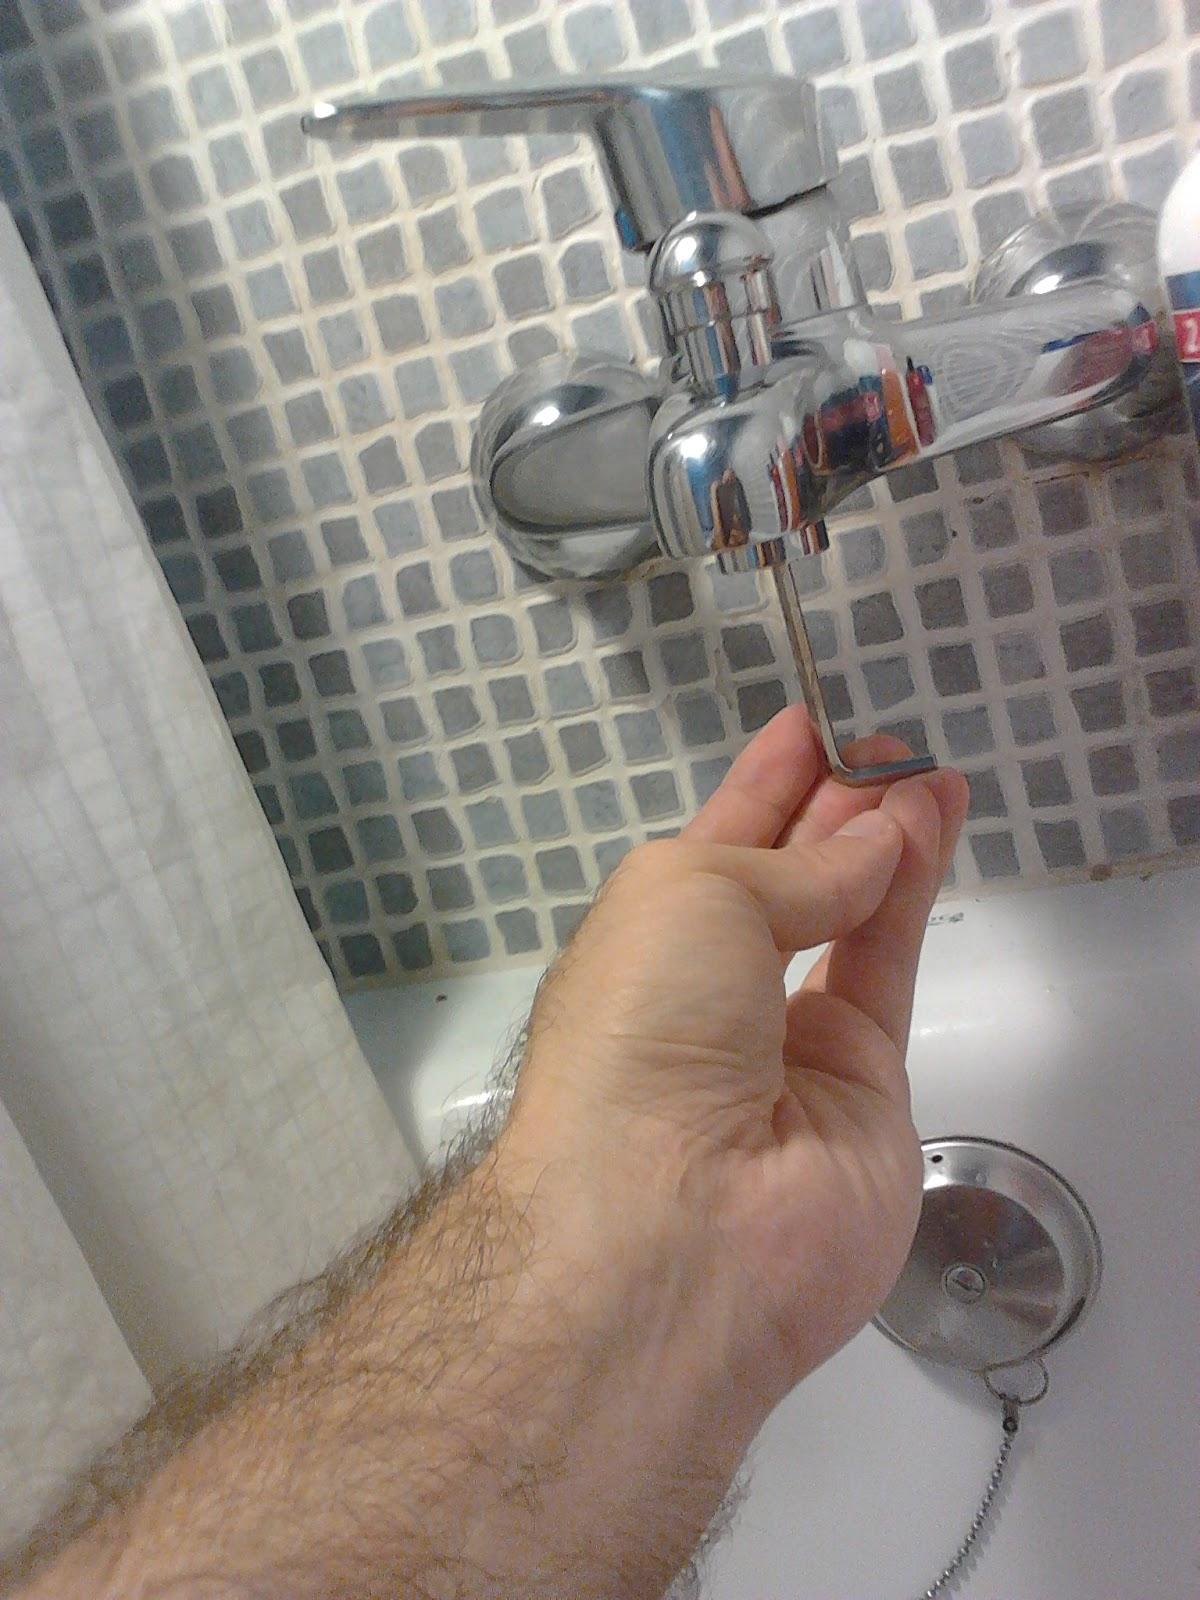 Grifos de ducha precios affordable grifo de cocina for Como arreglar una llave de ducha que gotea